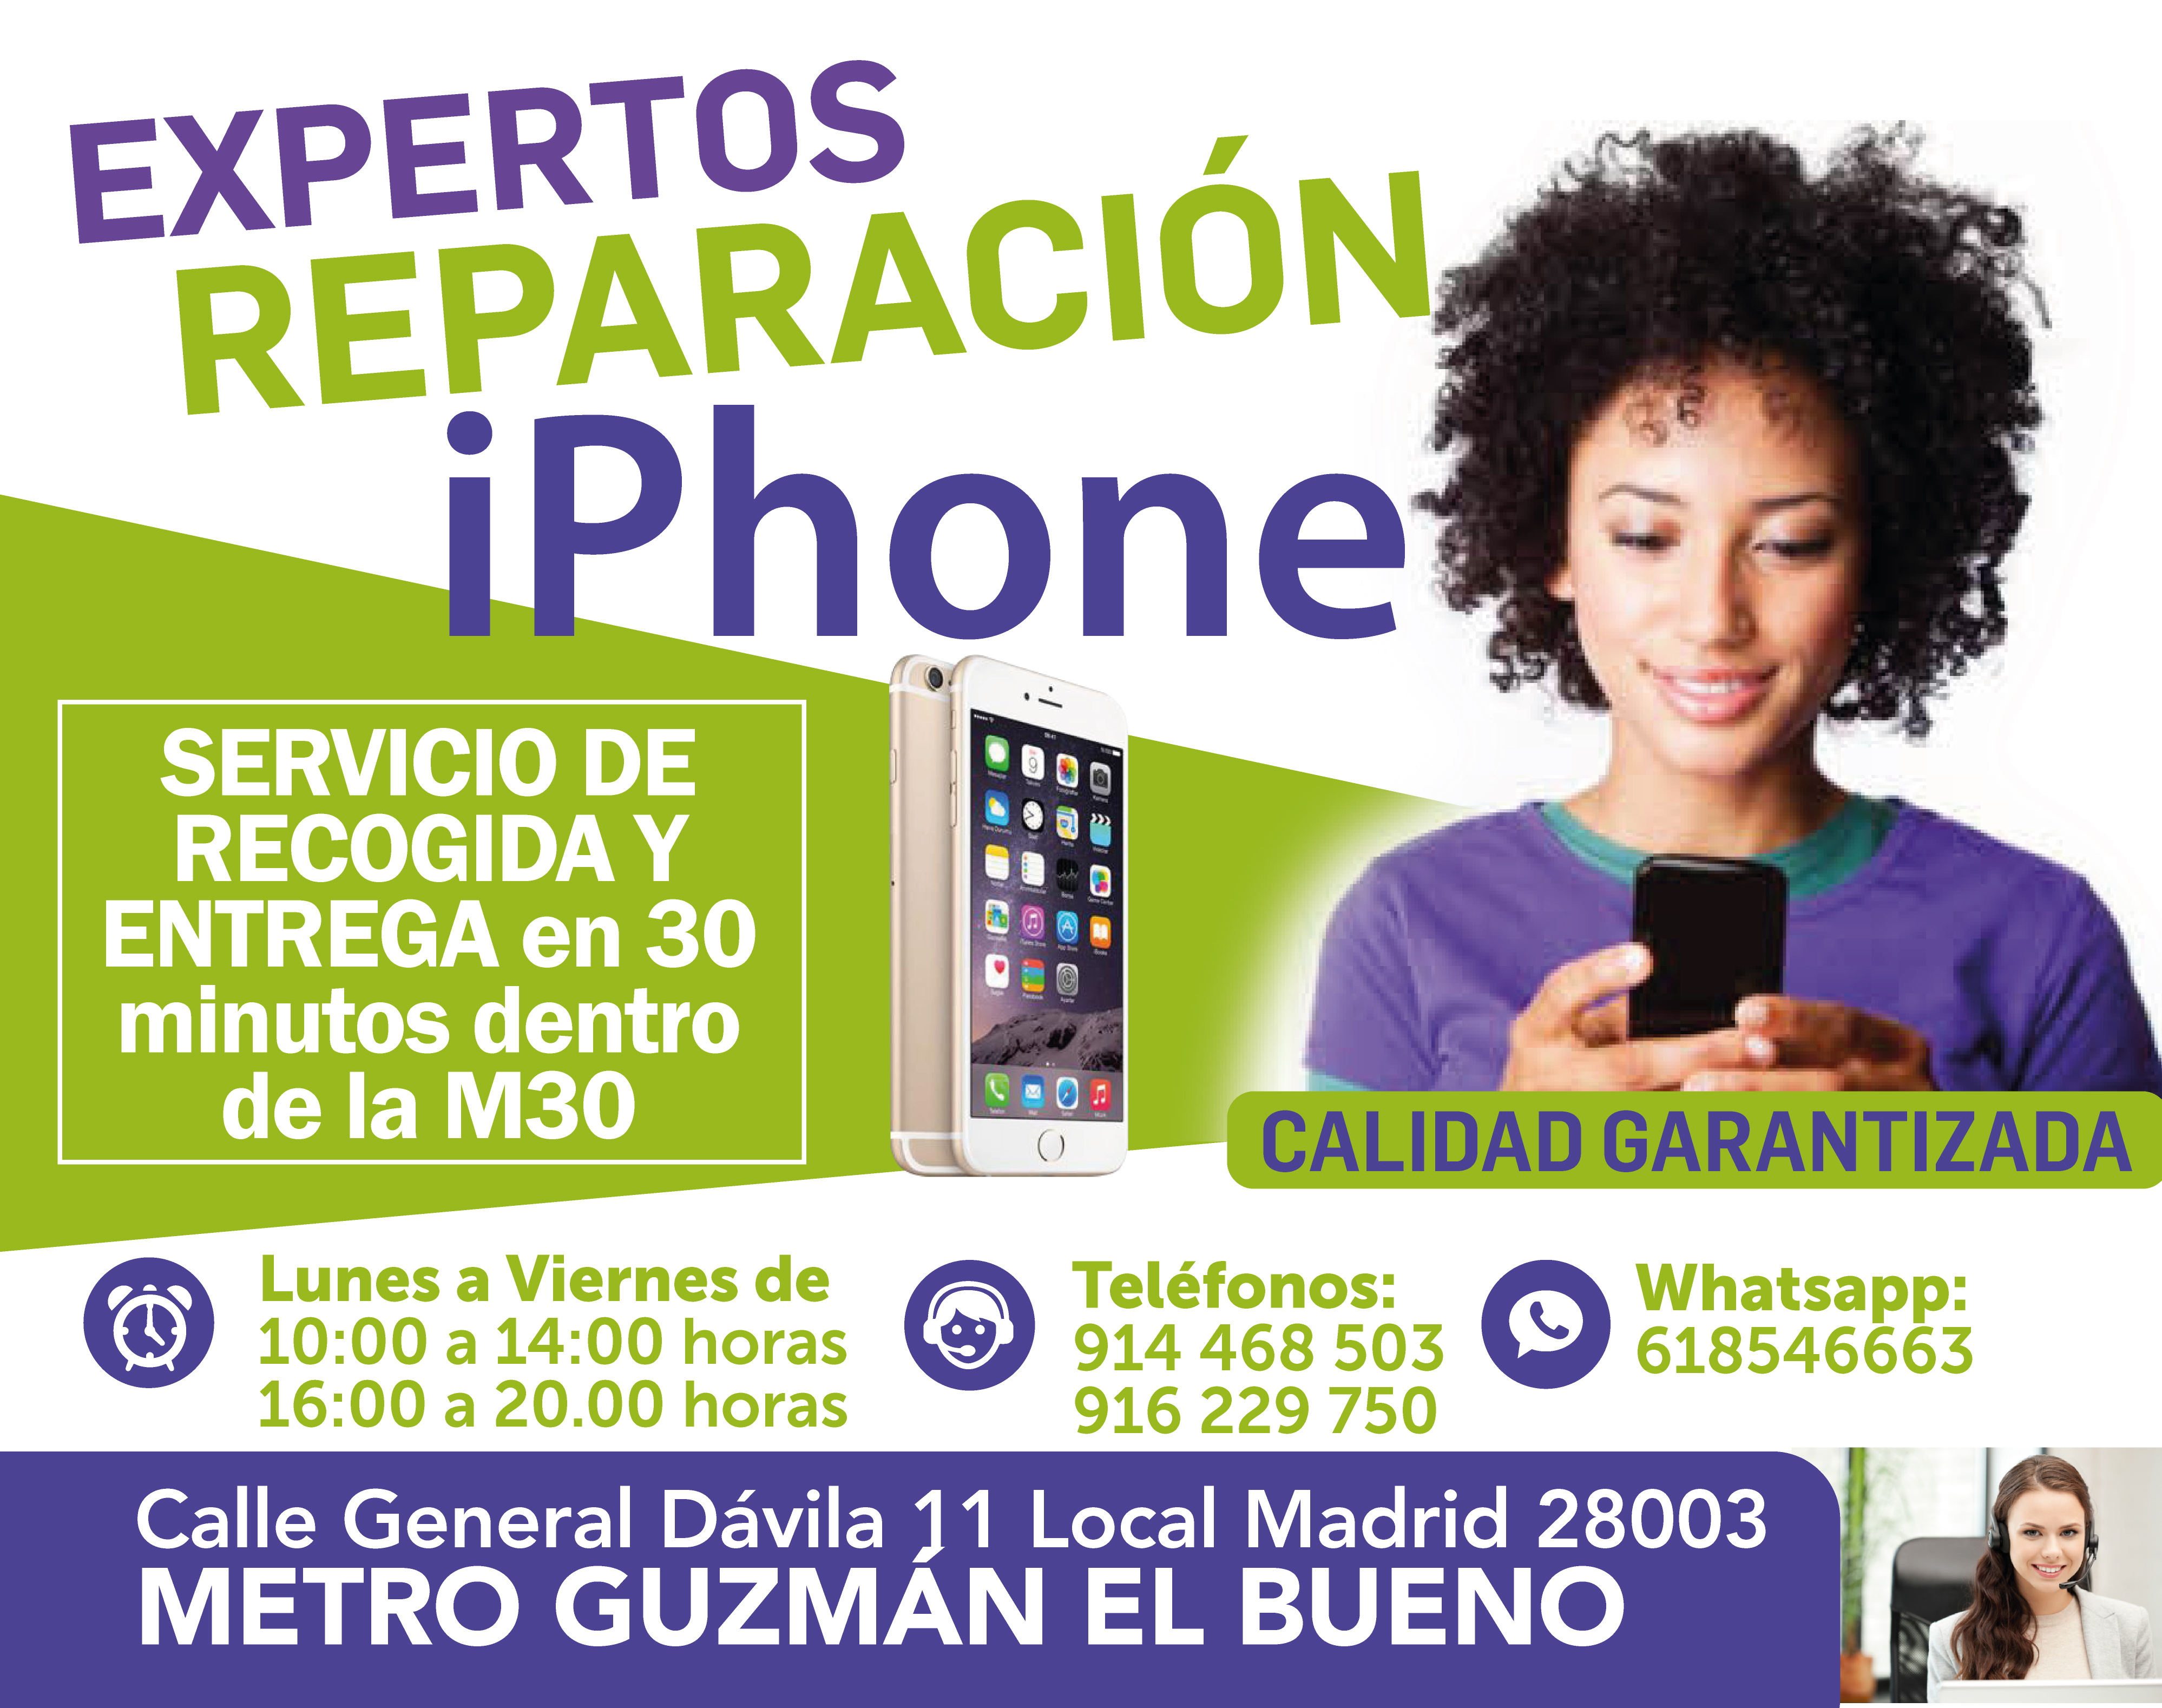 madritech rapidez en reparacion iphone